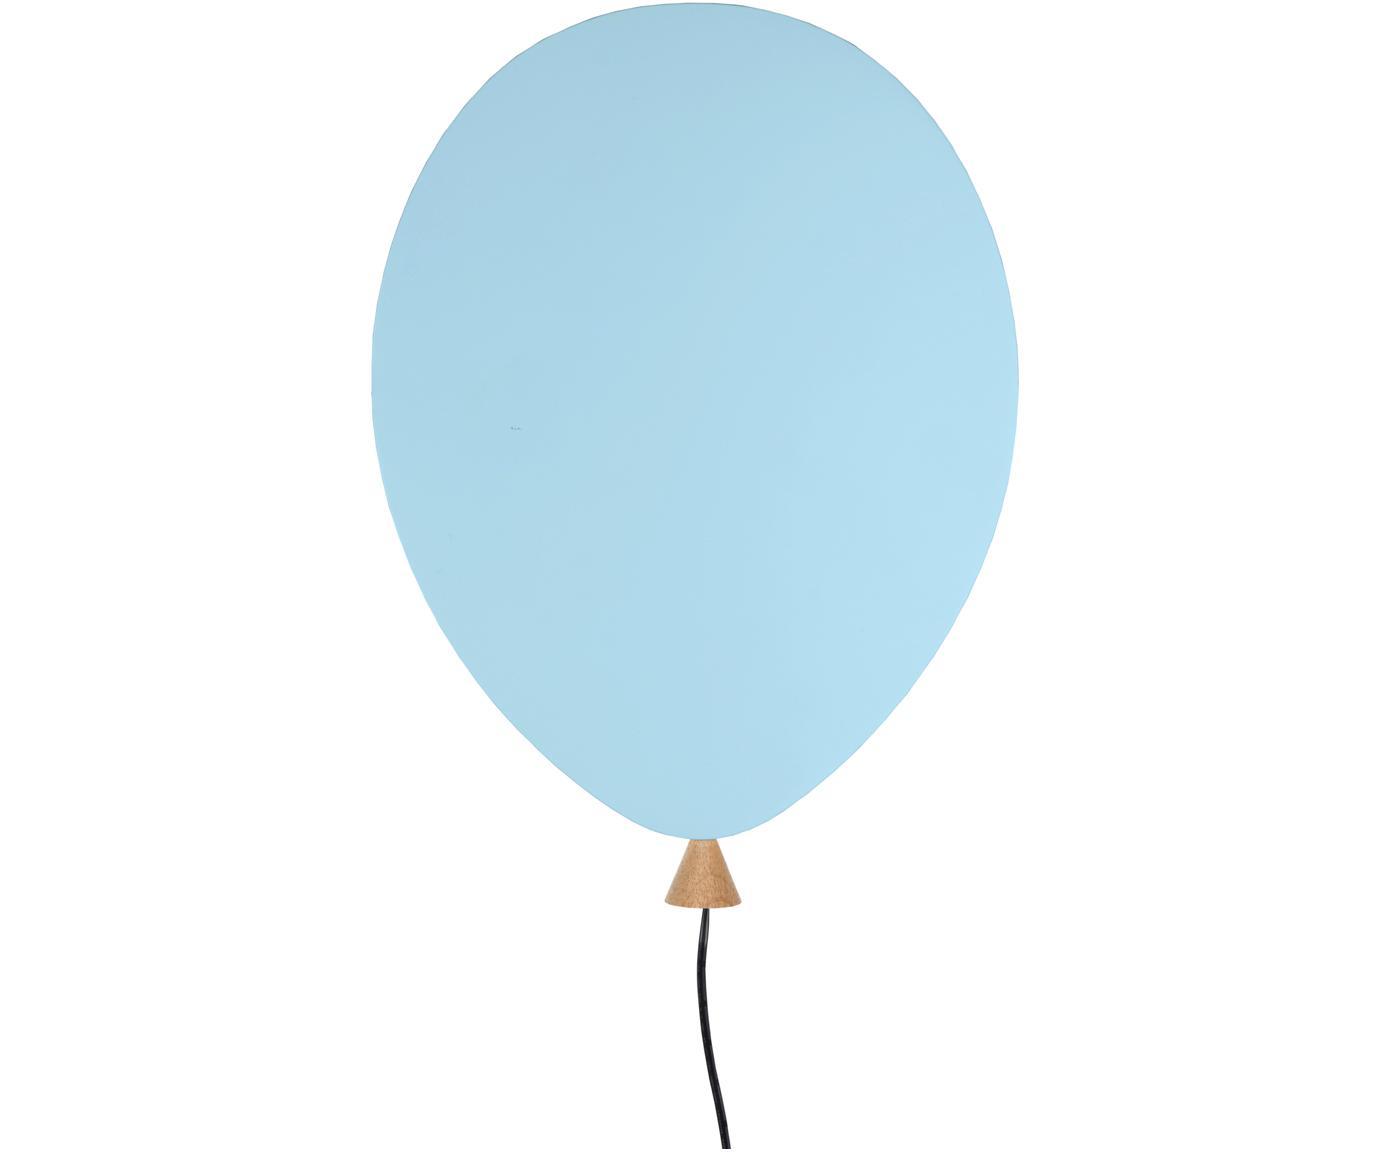 Wandlamp Balloon met stekker, Lampenkap: gecoat hout, Blauw, 25 x 35 cm